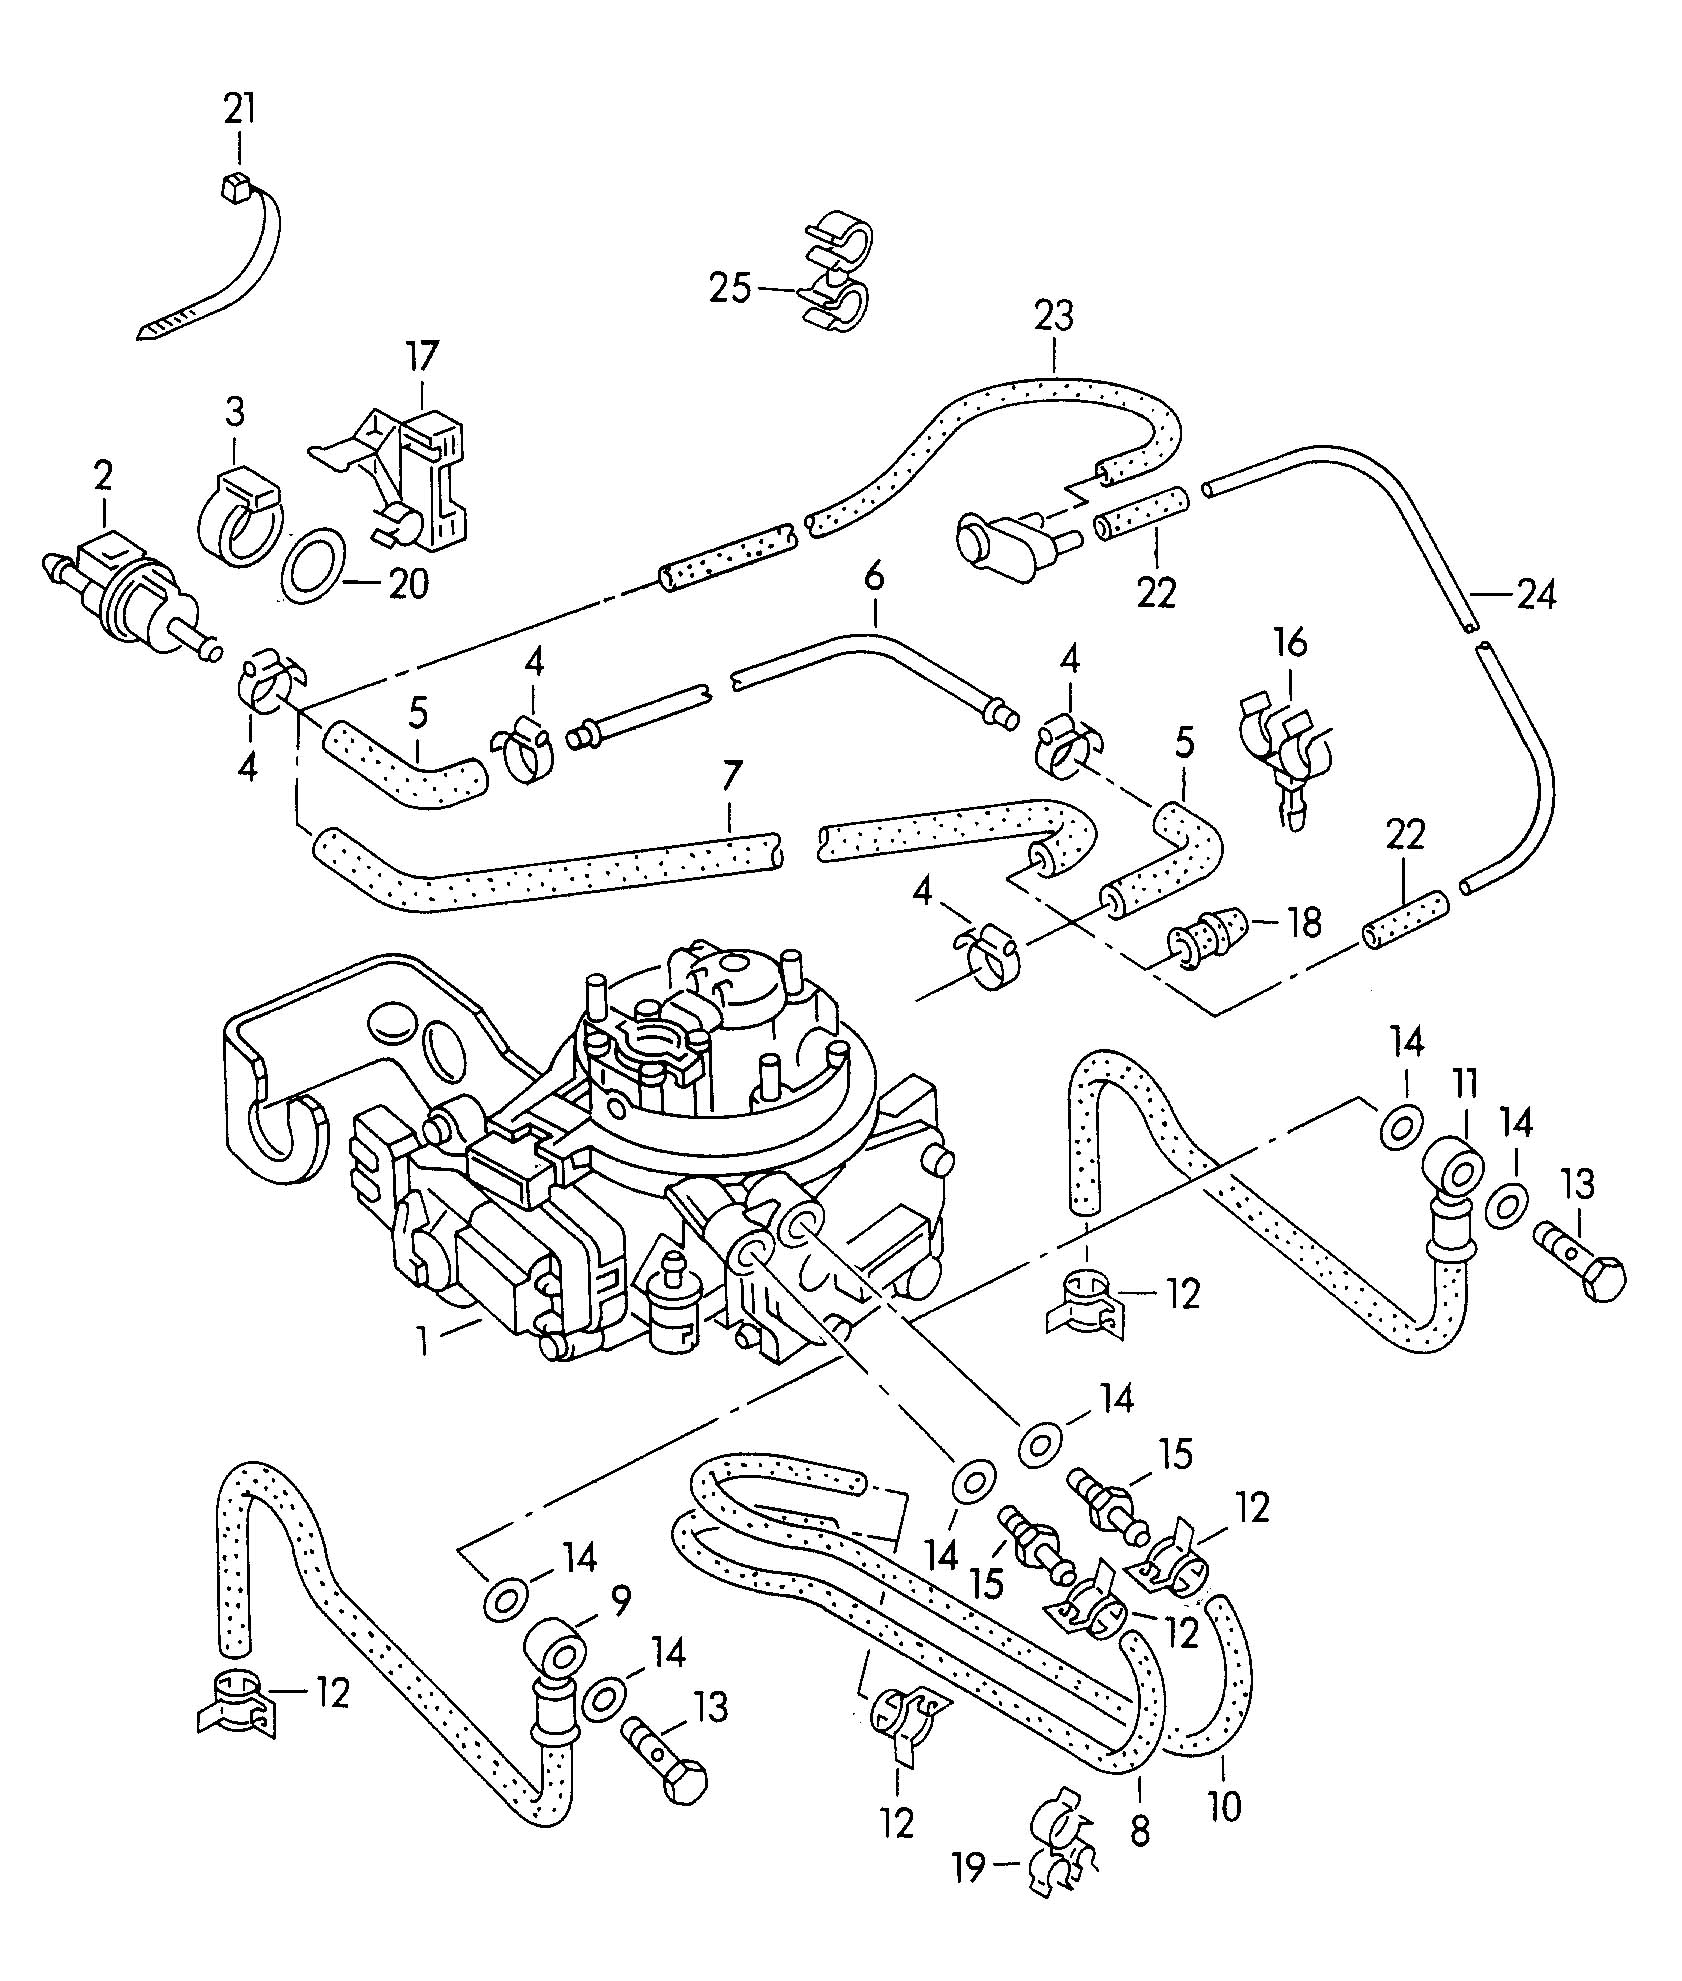 Volkswagen Golf Vacuum System Fuel Line 1 8ltr